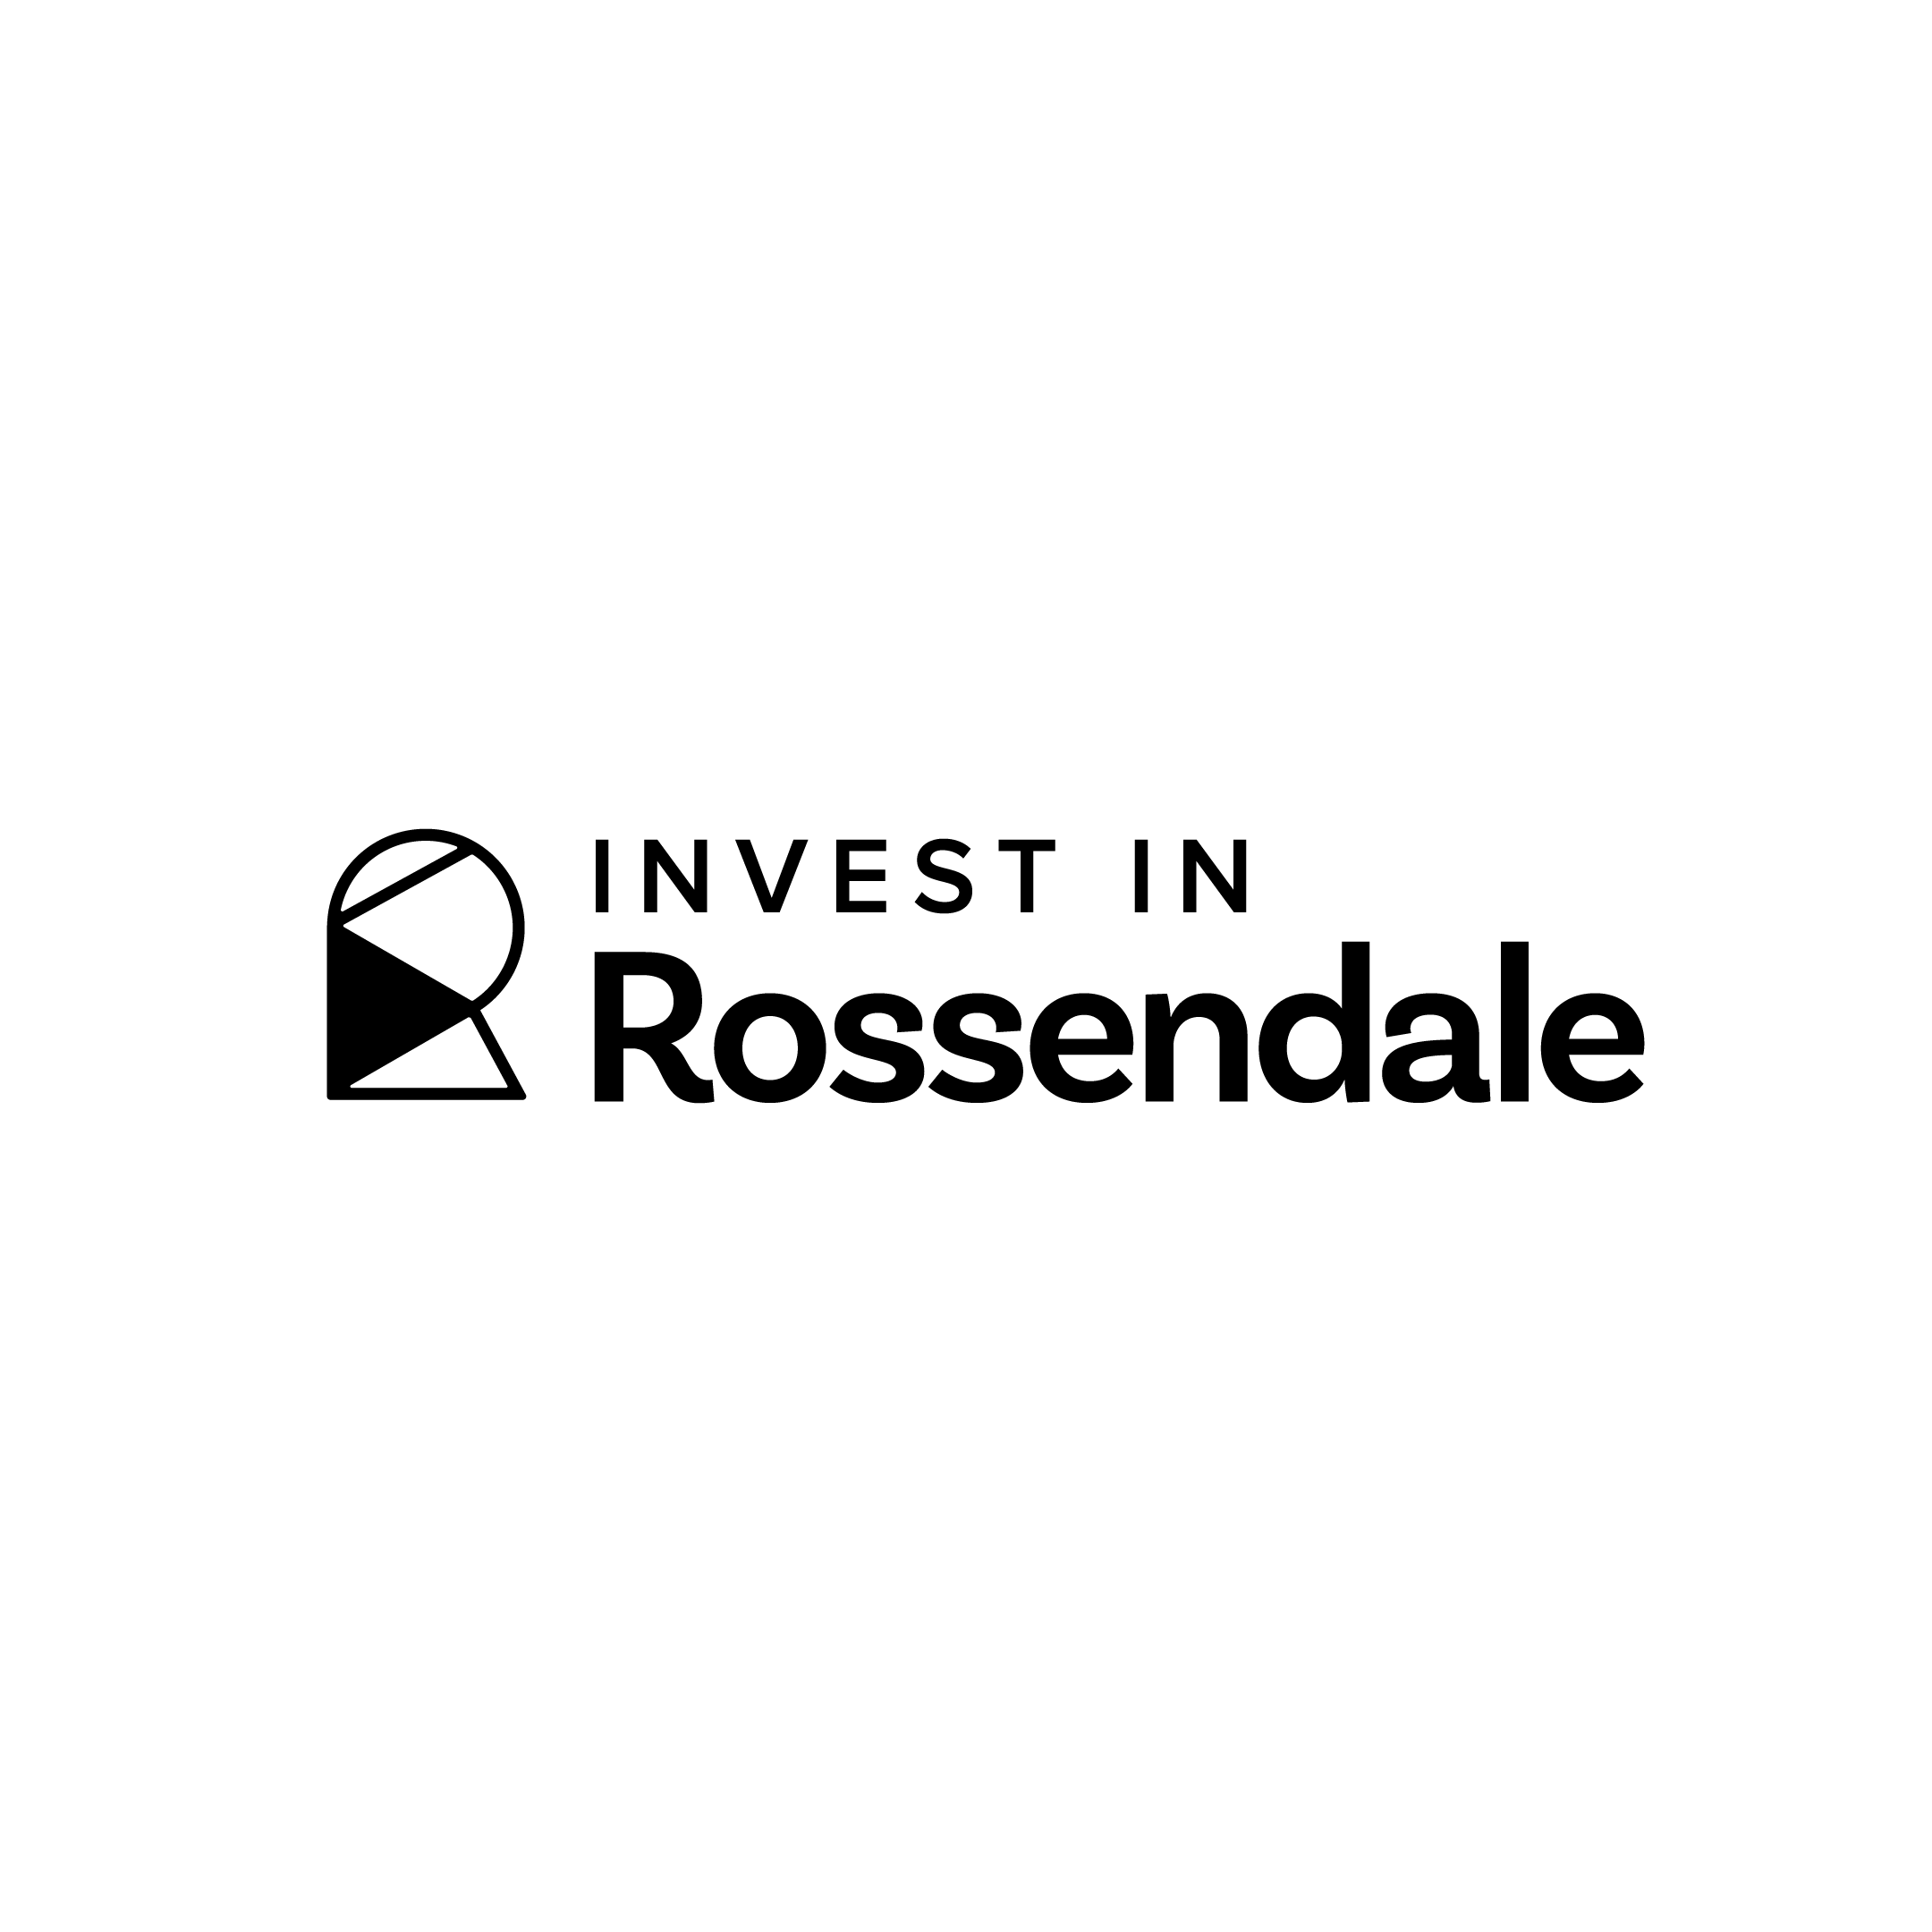 Logo_Invest-in-Rossendale